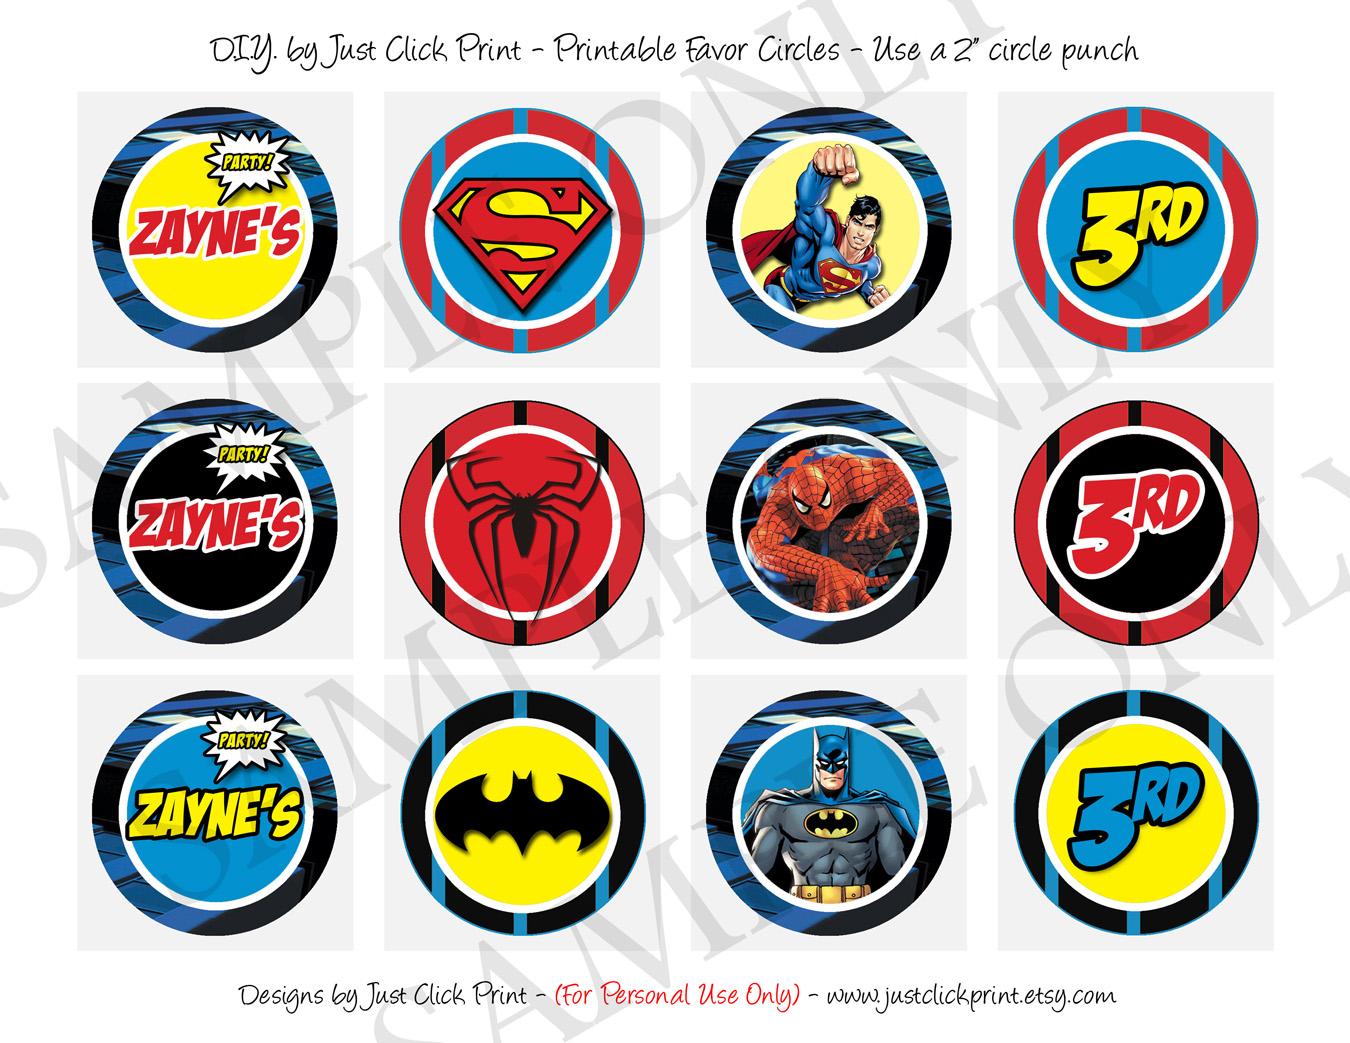 image about Printable Superman Logos identify Superheroes Emblems Batman Superman Spiderman Birthday Invitation Printable versus Basically Simply click Print